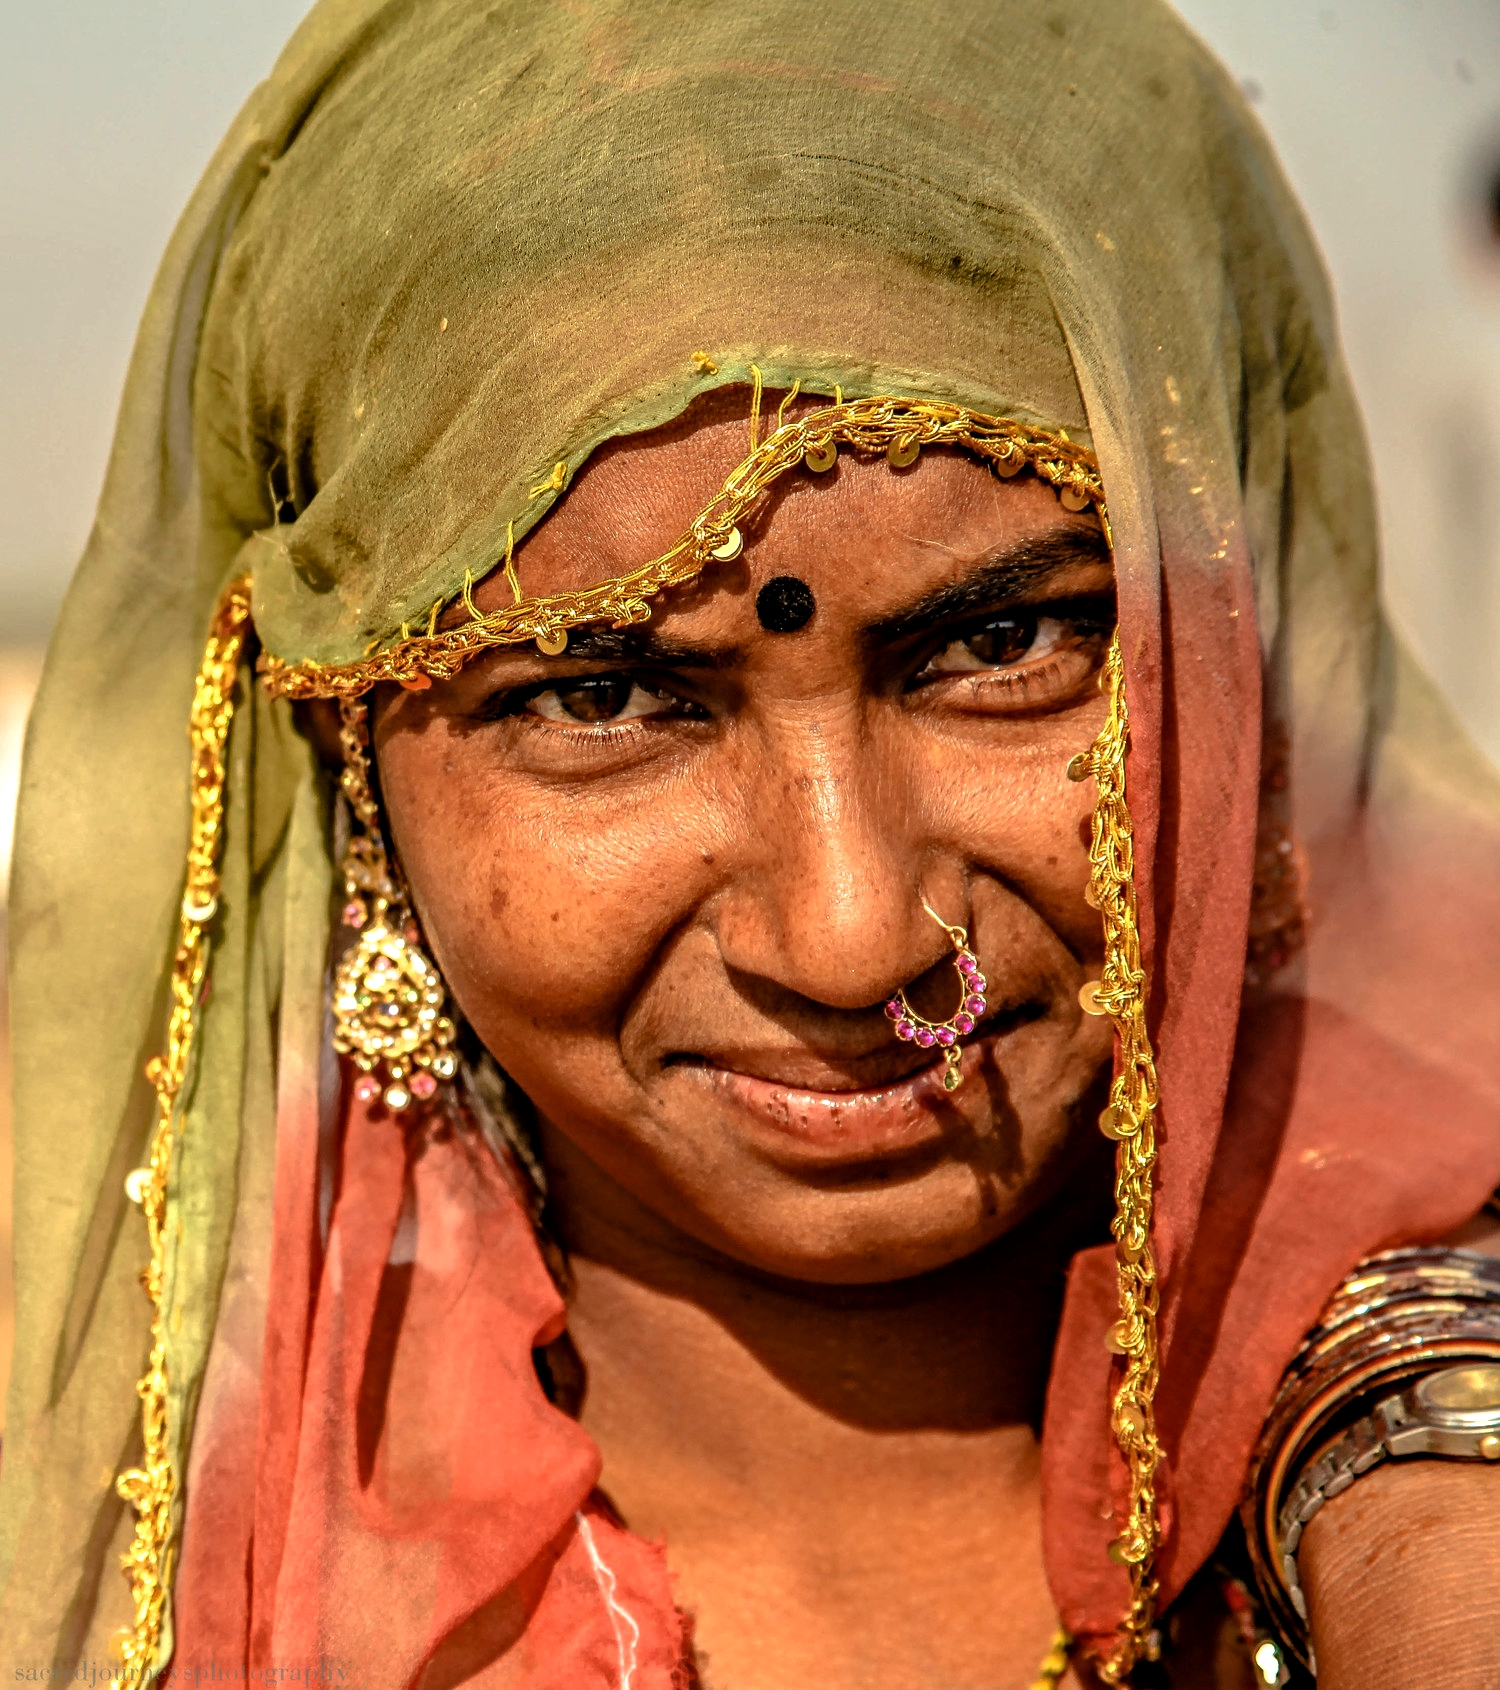 Pushkar woman with nose ring.jpg